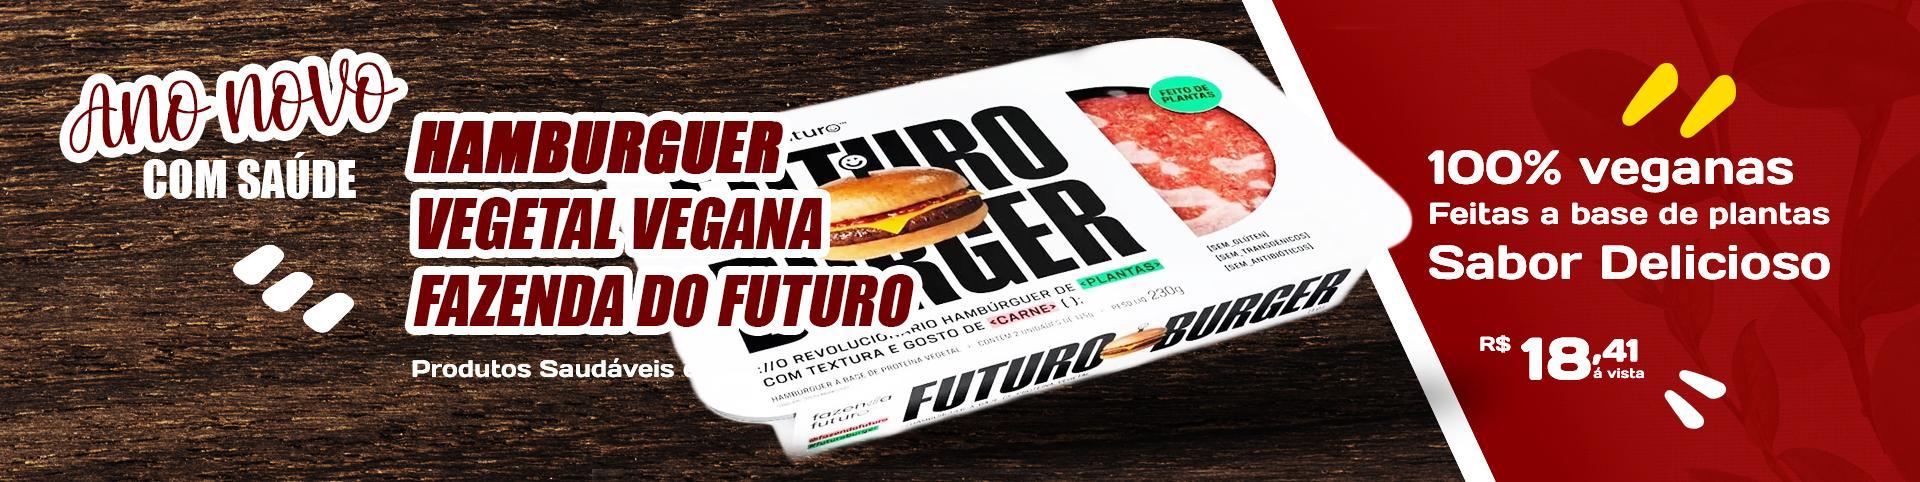 fazenda do futuro hamburguer